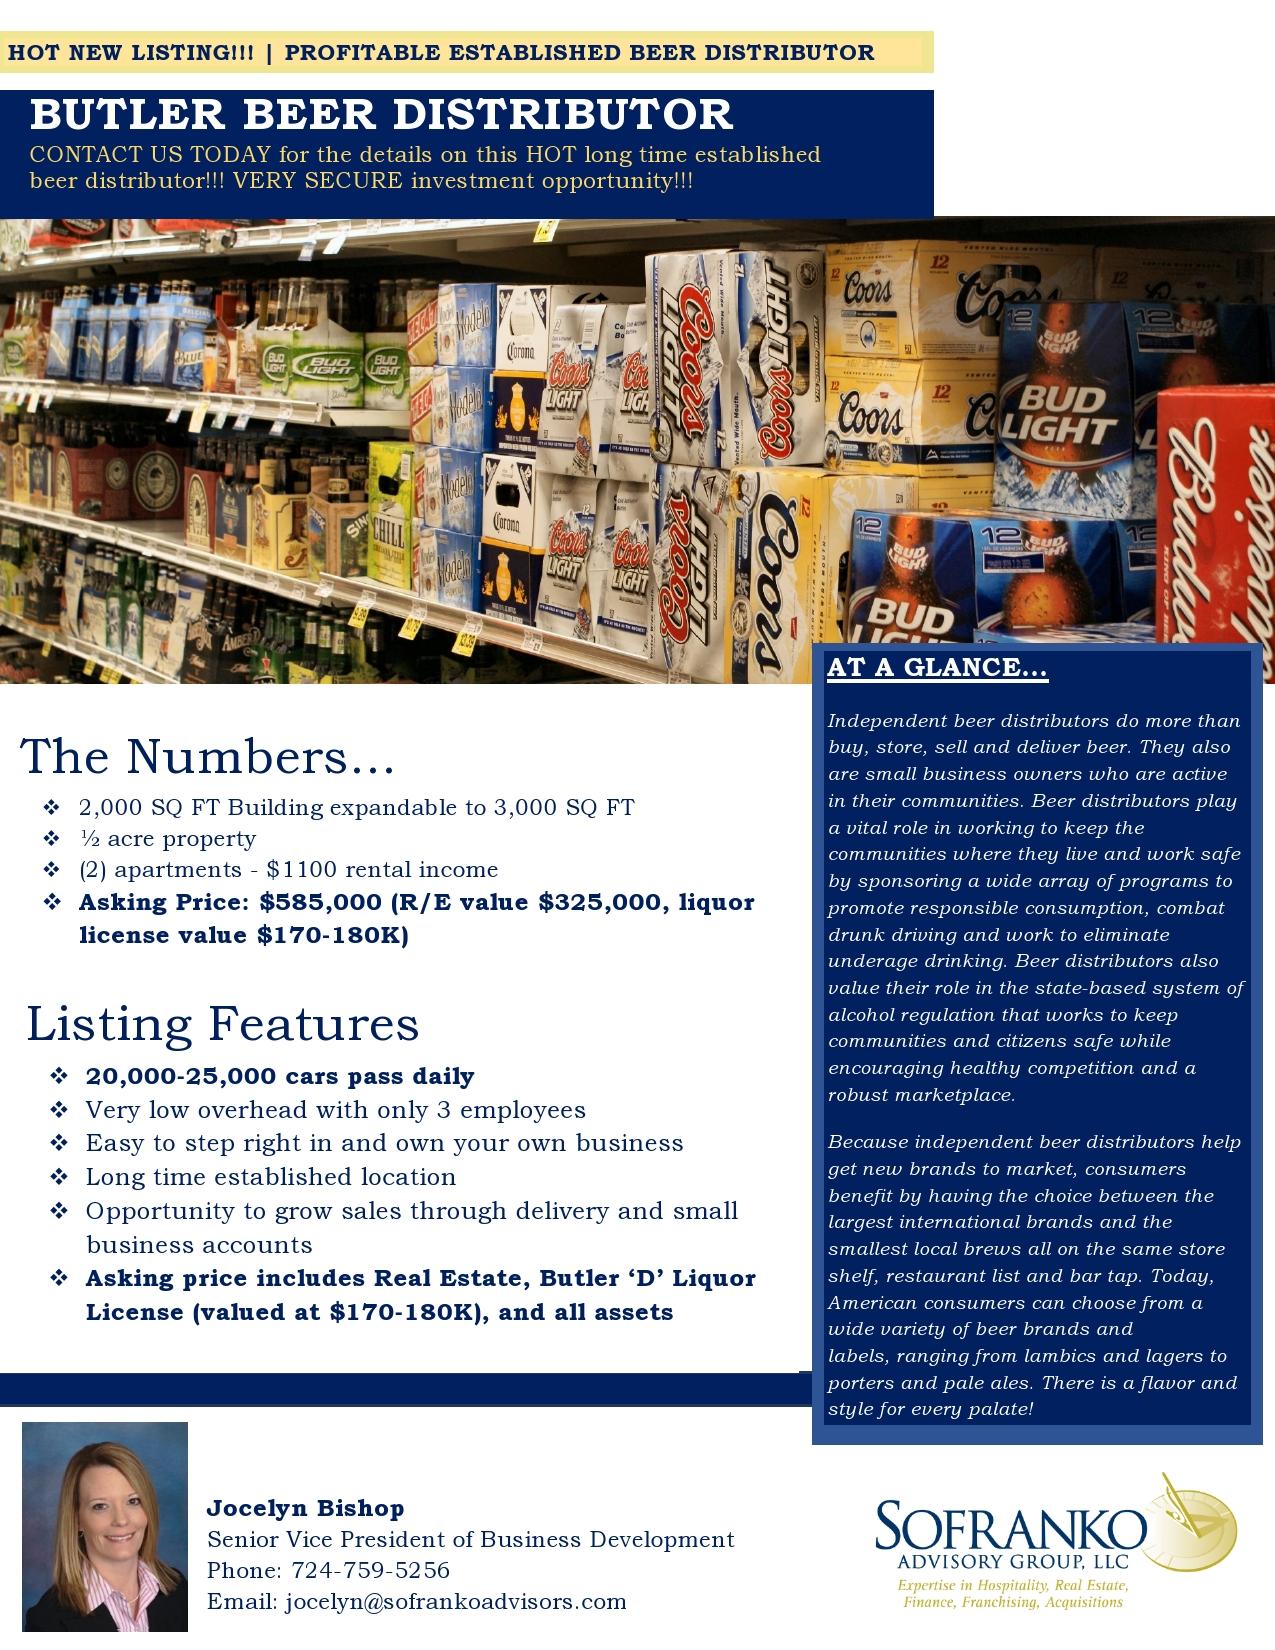 Butler Beer Distributor-page0001